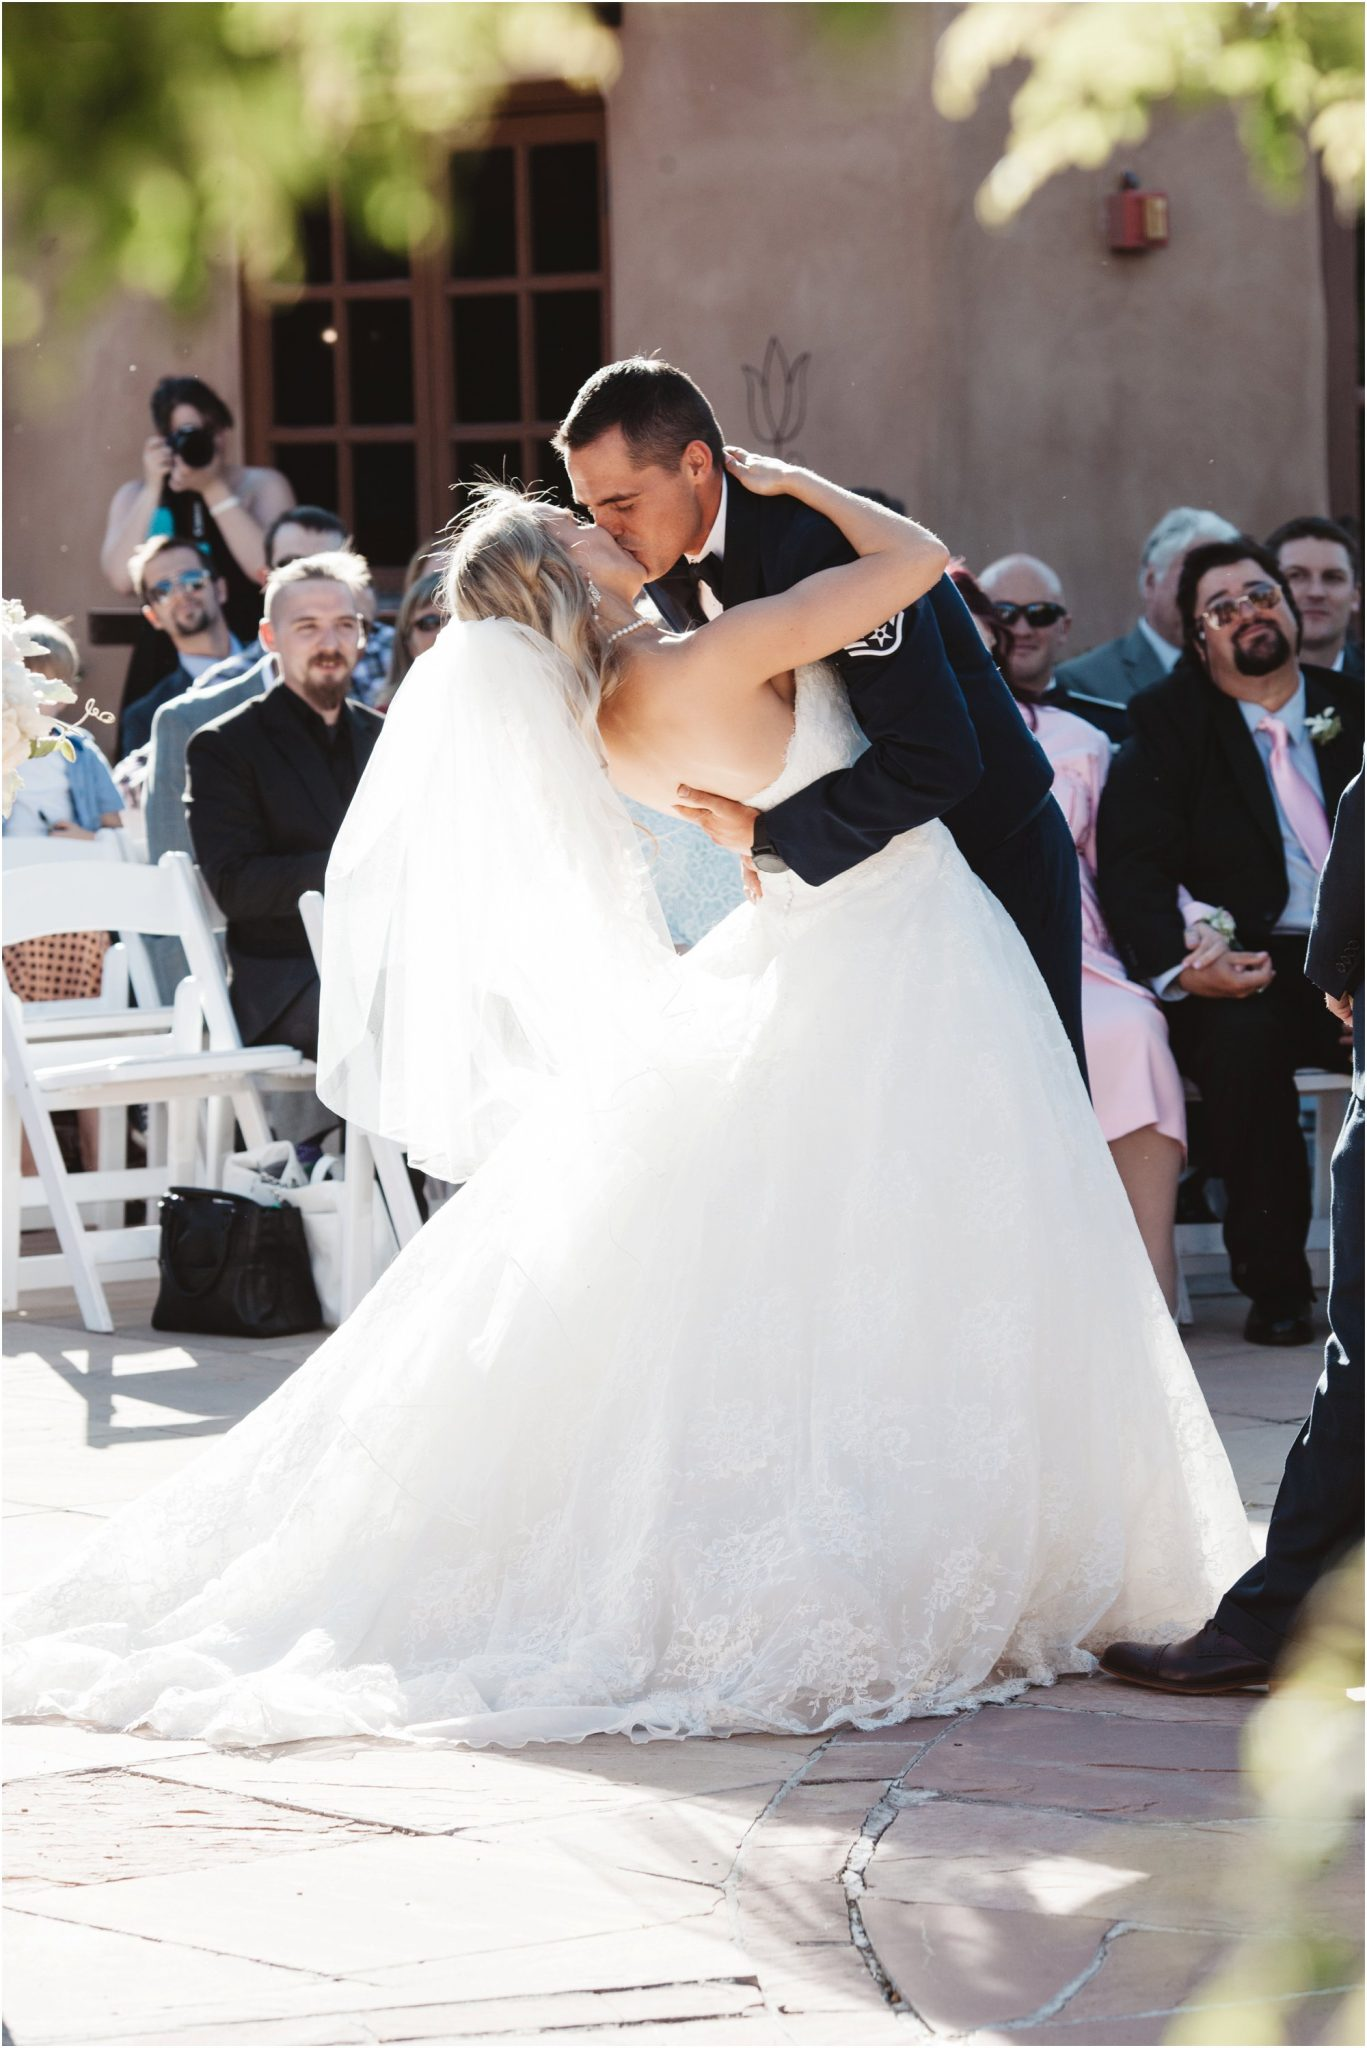 New Mexico, Albuquerque, Santa Fe, wedding photography, La Fonda wedding pictures